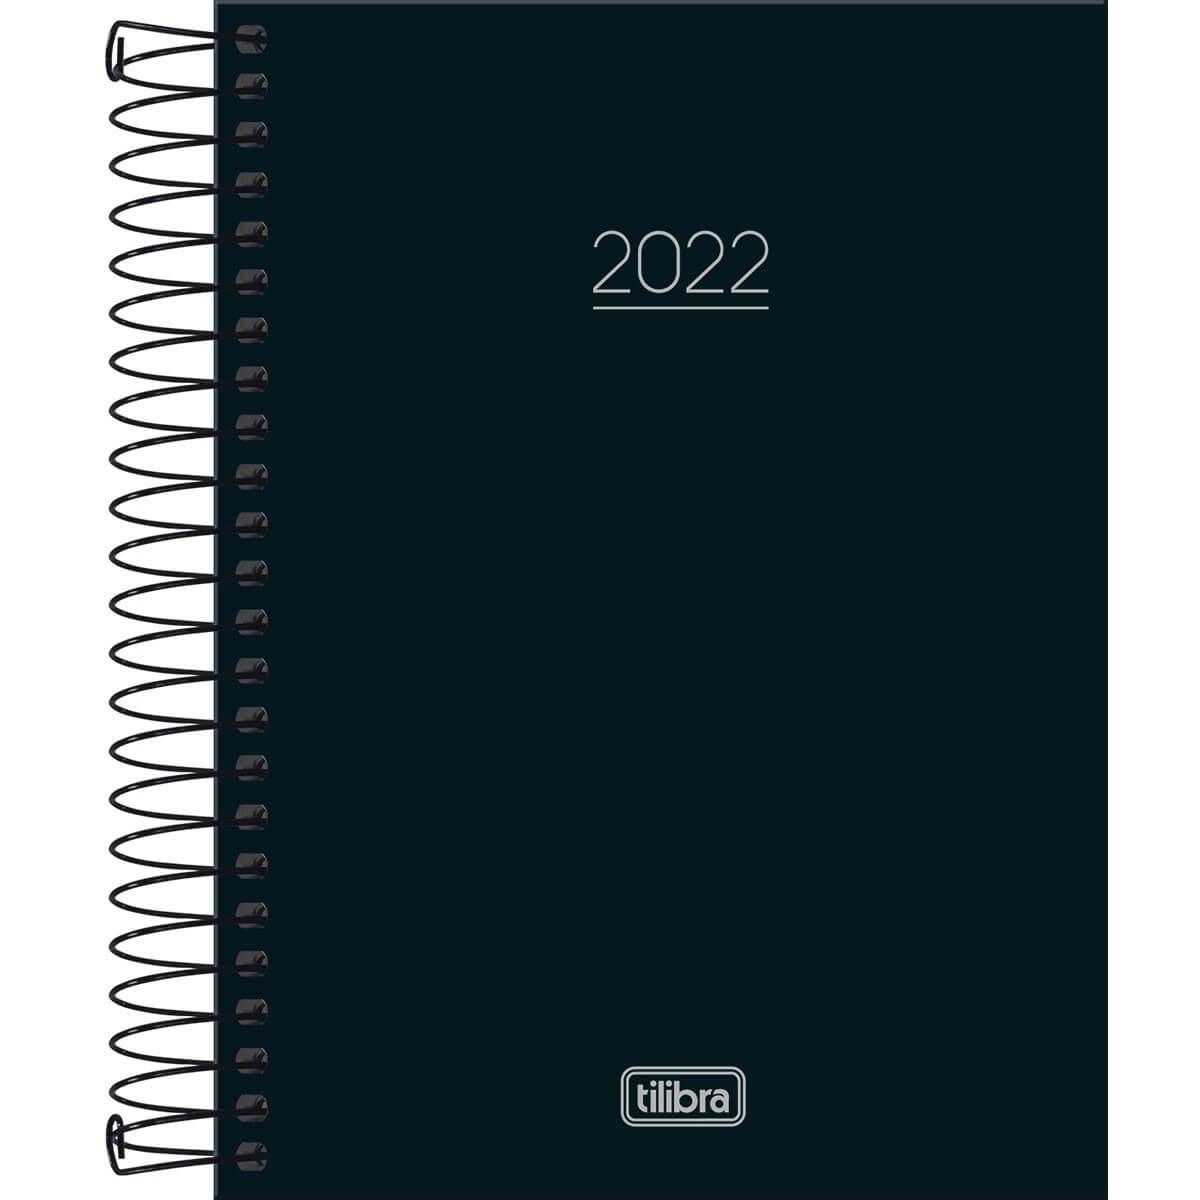 Agenda Espiral Diária 11,7 x 16,4 cm Pepper Preta 2022 - Tilibra